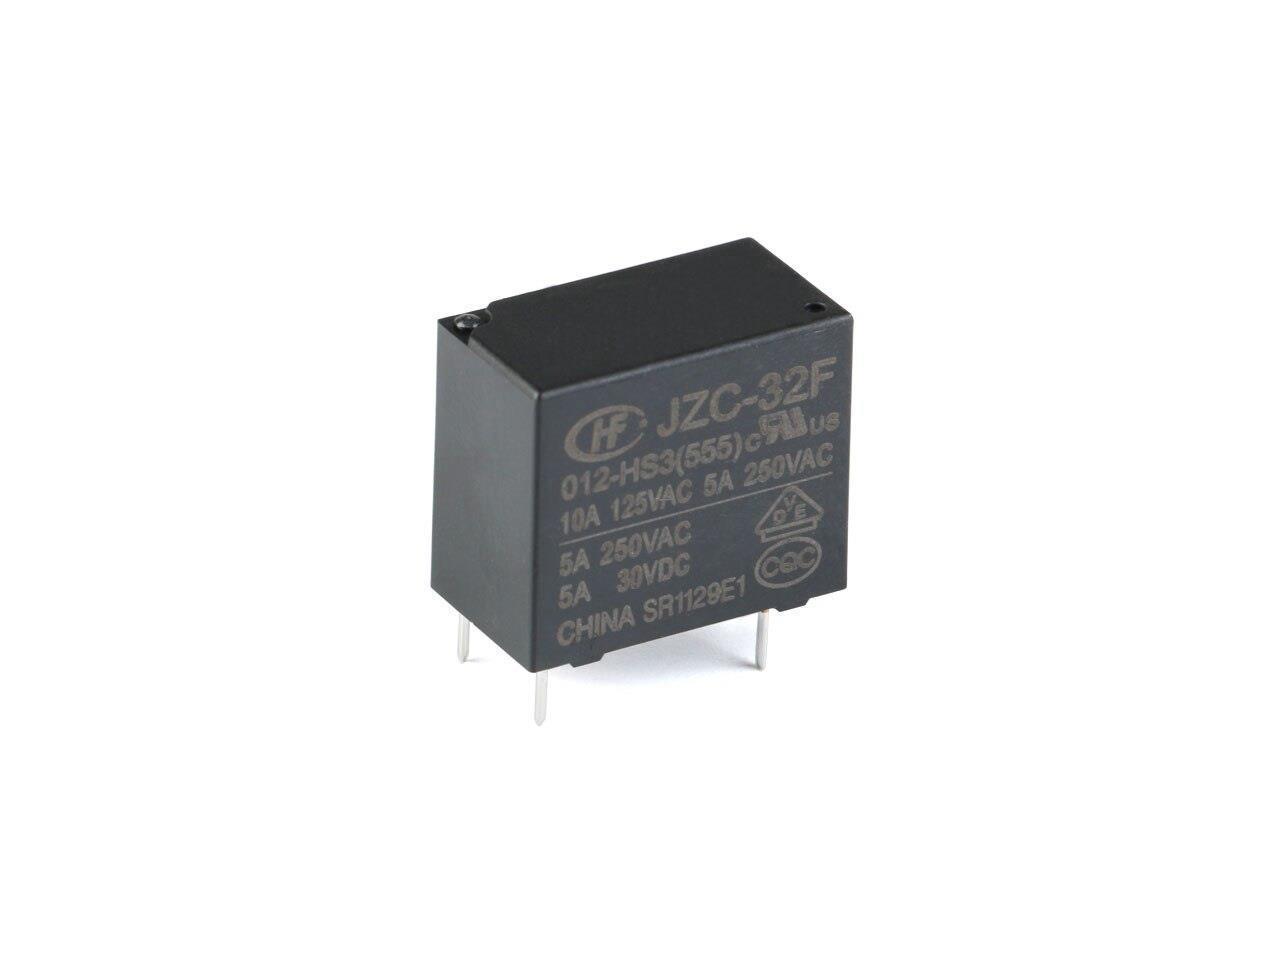 005 012 024-HS3 10A 4-Pins Hongfa MINI Power Relay 5V//12V//24V DC HF32F-JZC-32F